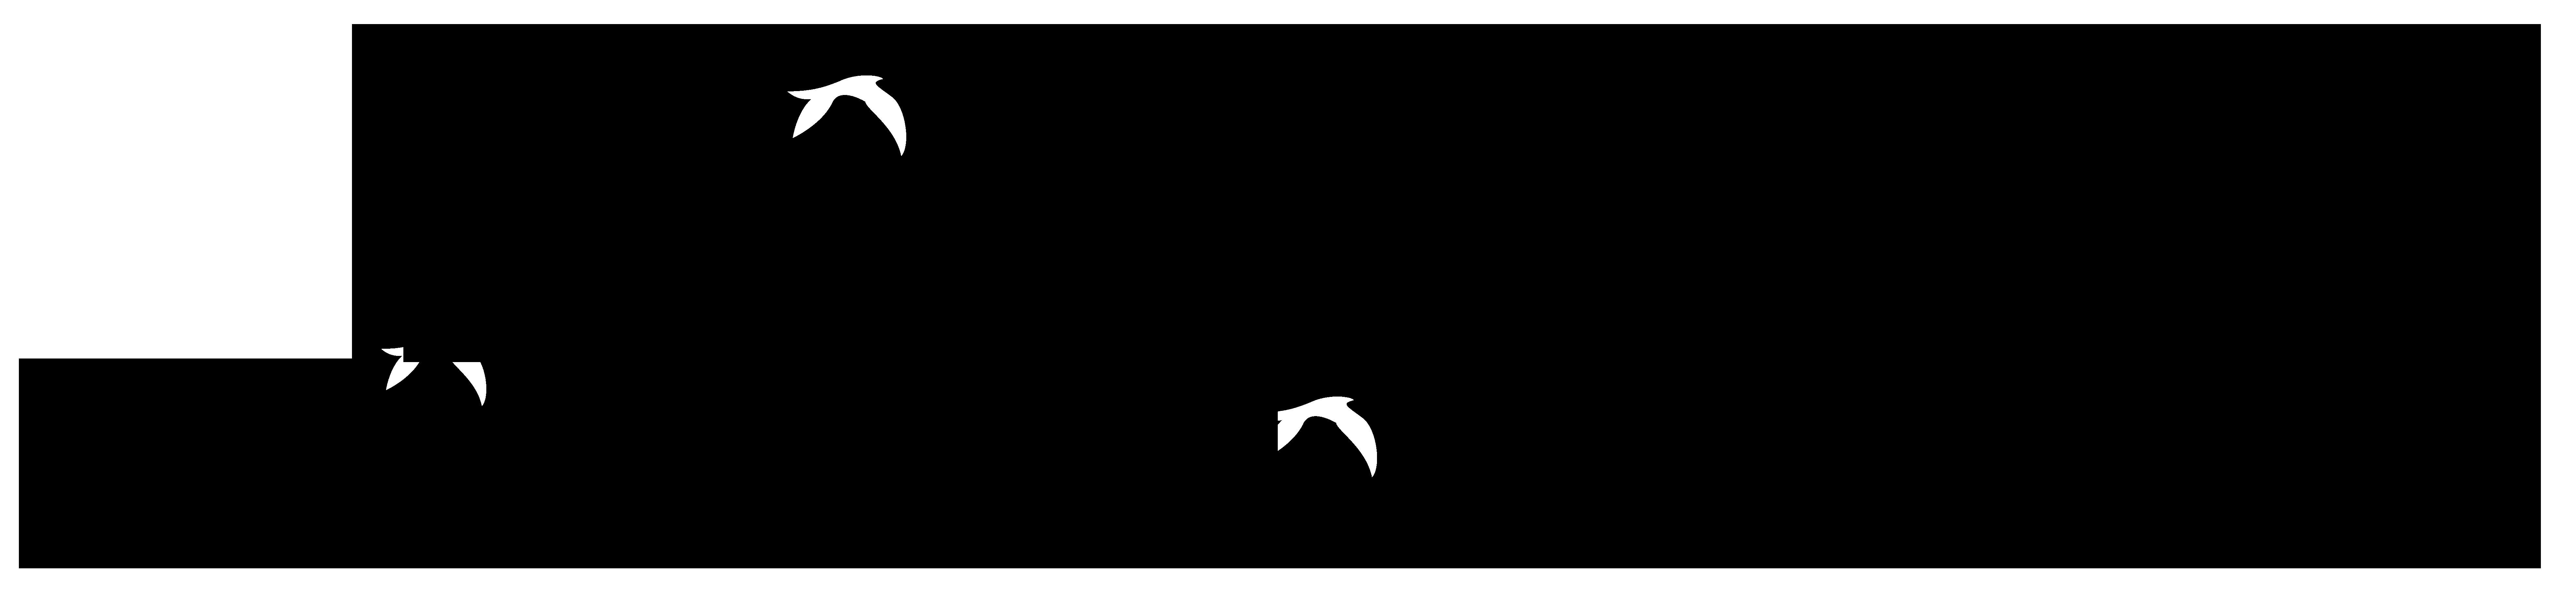 7919x1829 Clip Art Flying Bird Silhouette Cliparts Free Download Lemonize